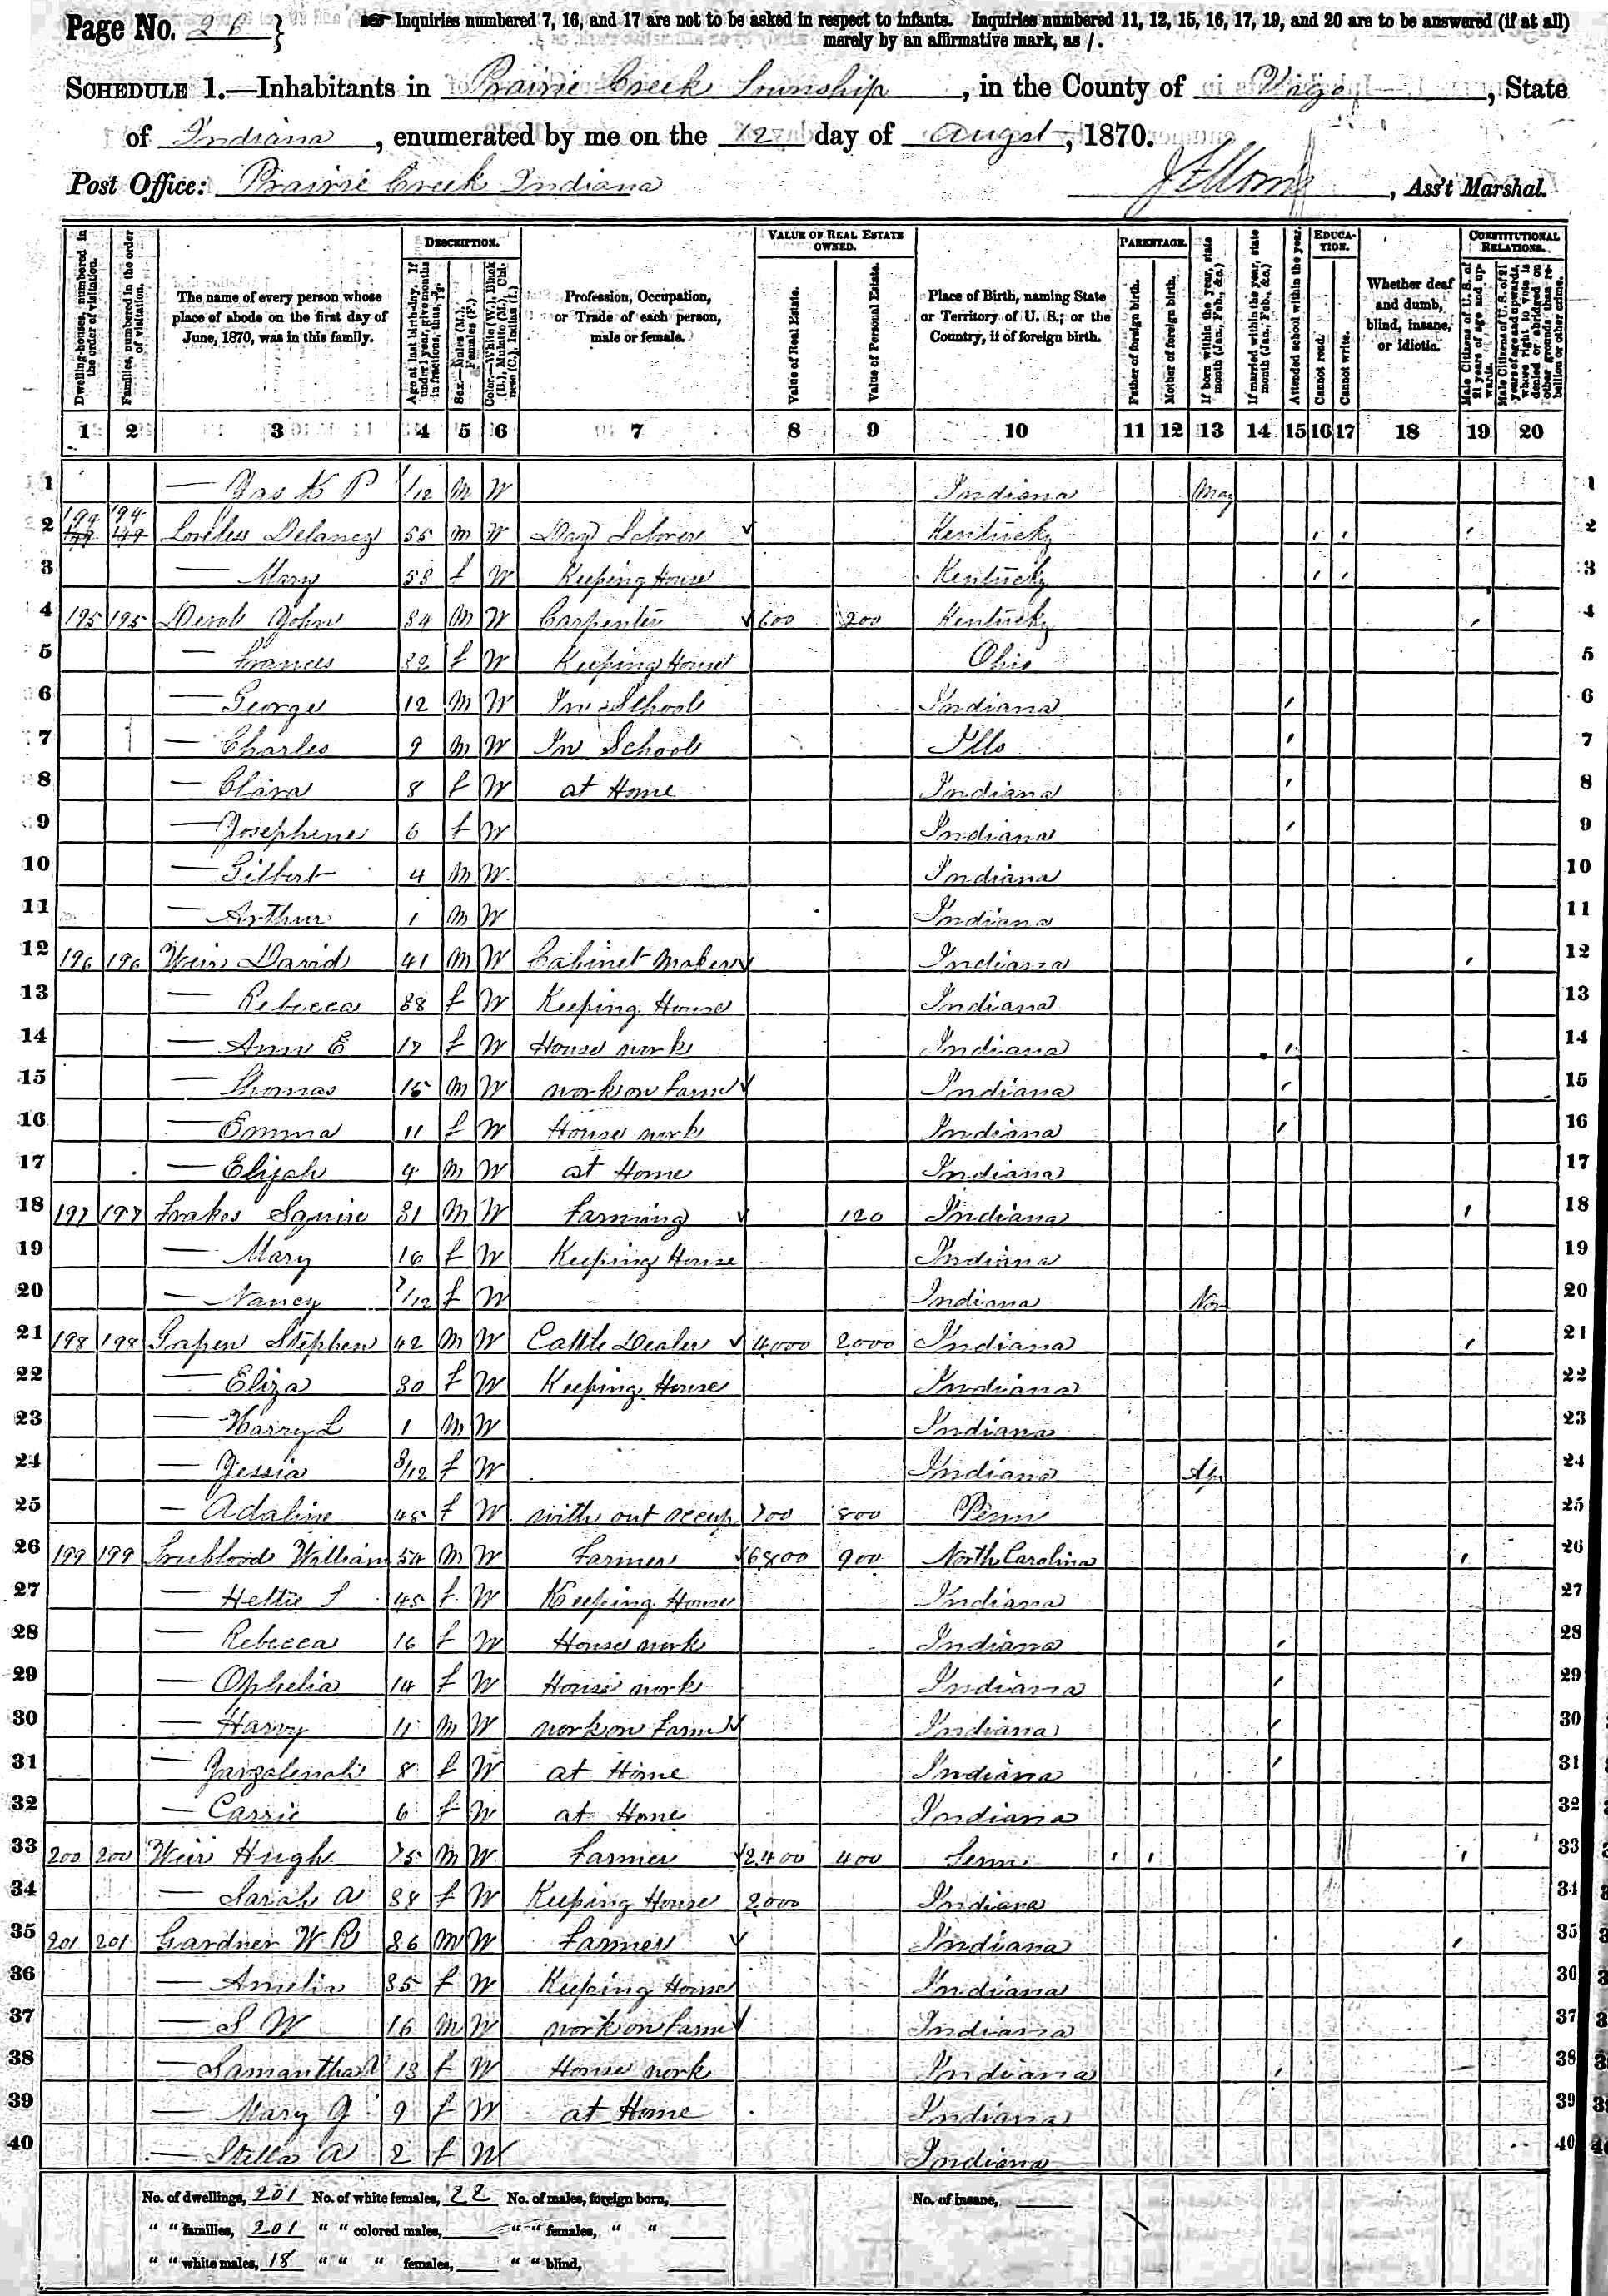 William trueblood and hetta taylor beauchamp 1870 census in vigo prairie creek john frances and clara devol near wm and hettie trueblood aiddatafo Gallery